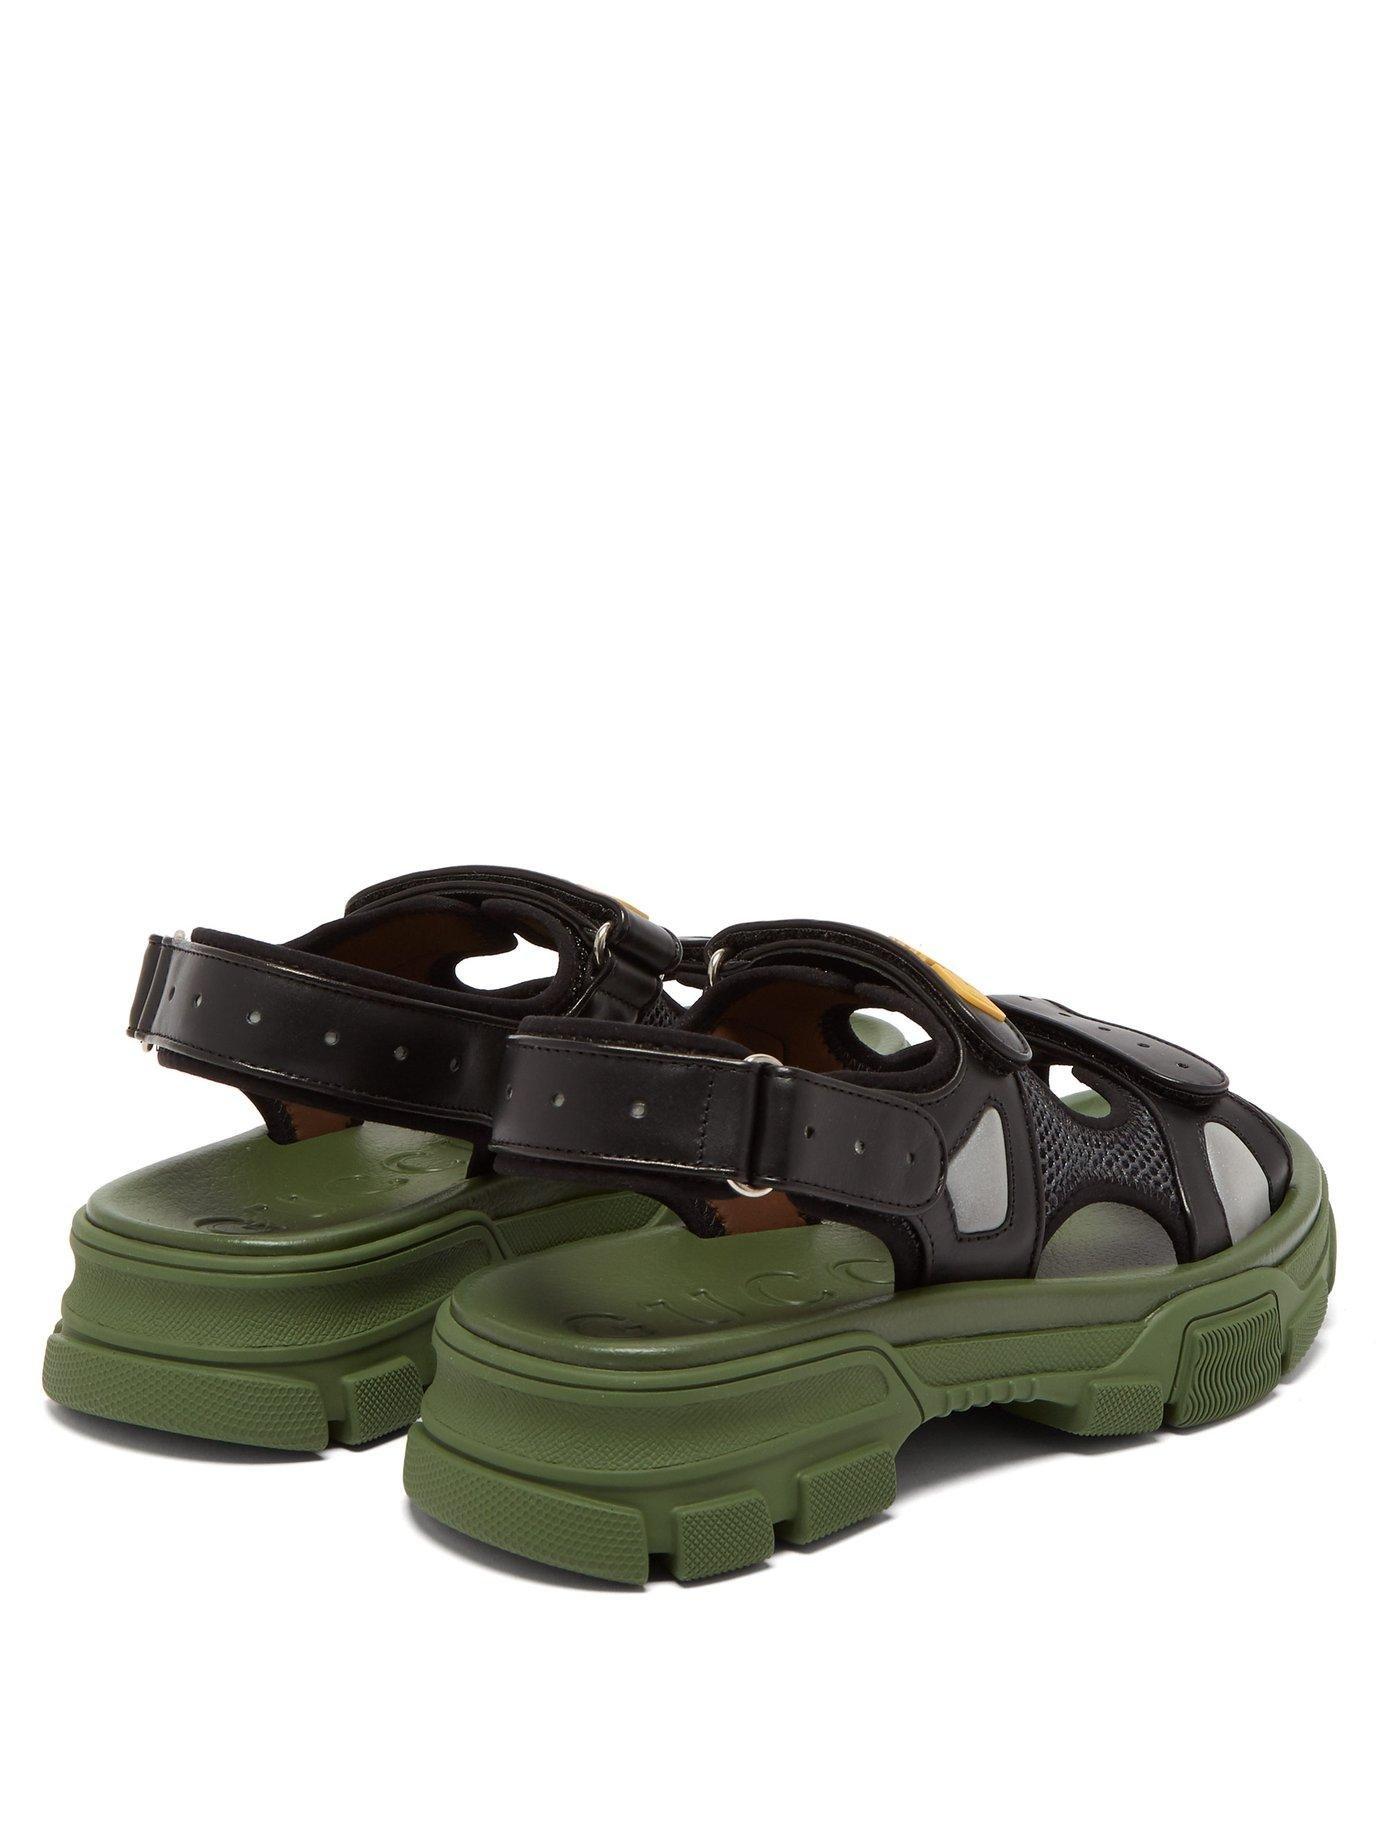 555604c80 Gucci Logo Appliqué Leather And Mesh Sandals - Lyst